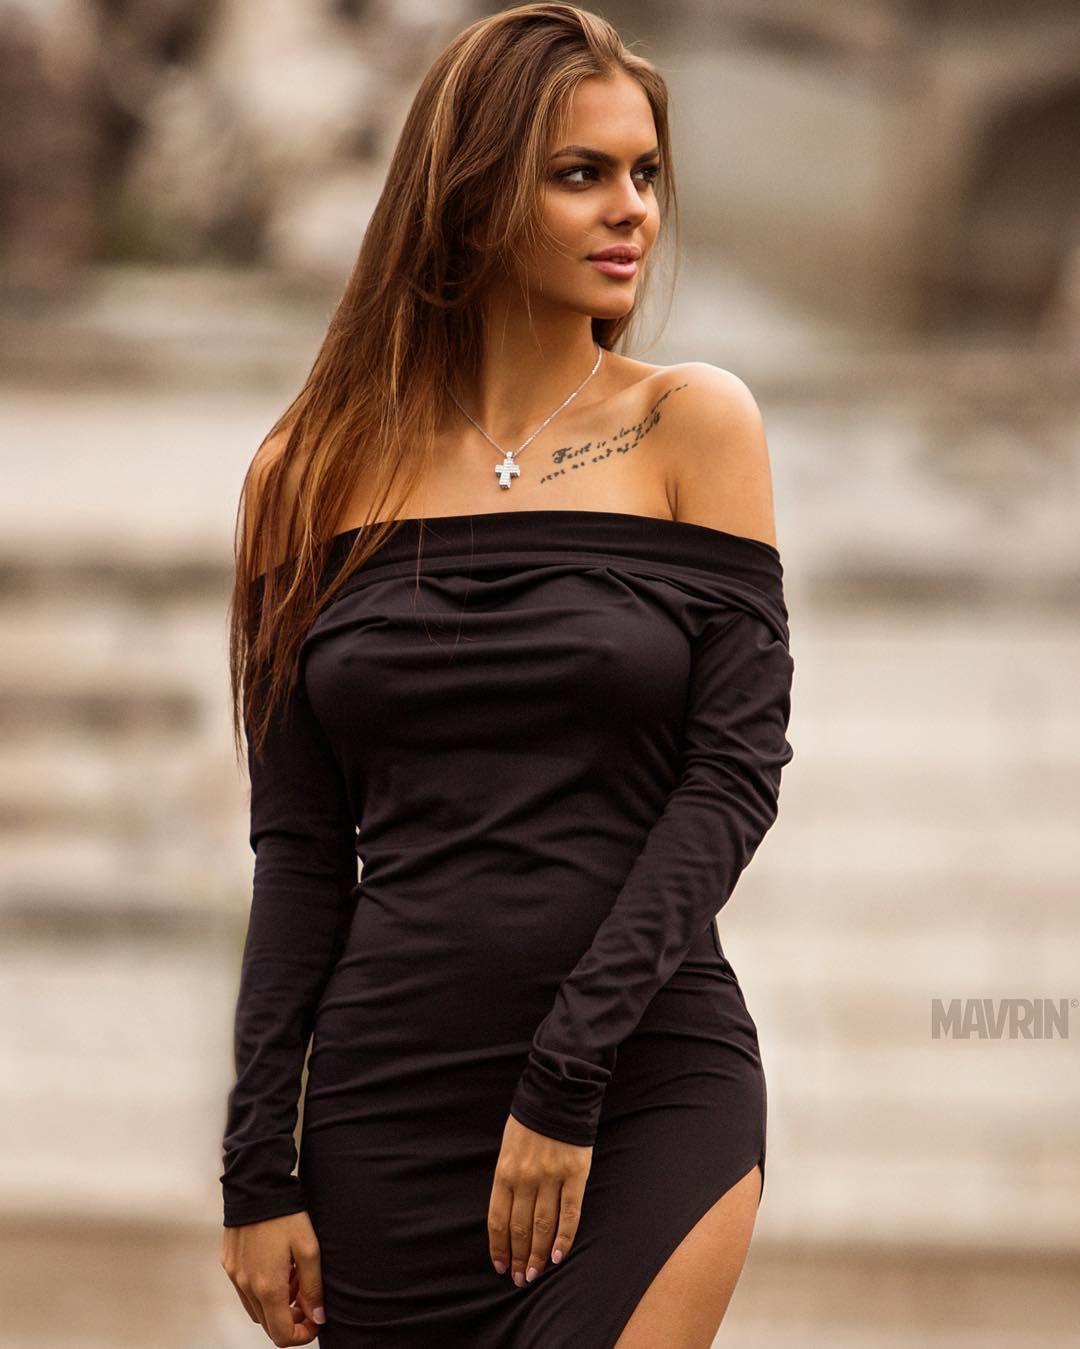 hottygram | Viki odintcova, Model, Russian models